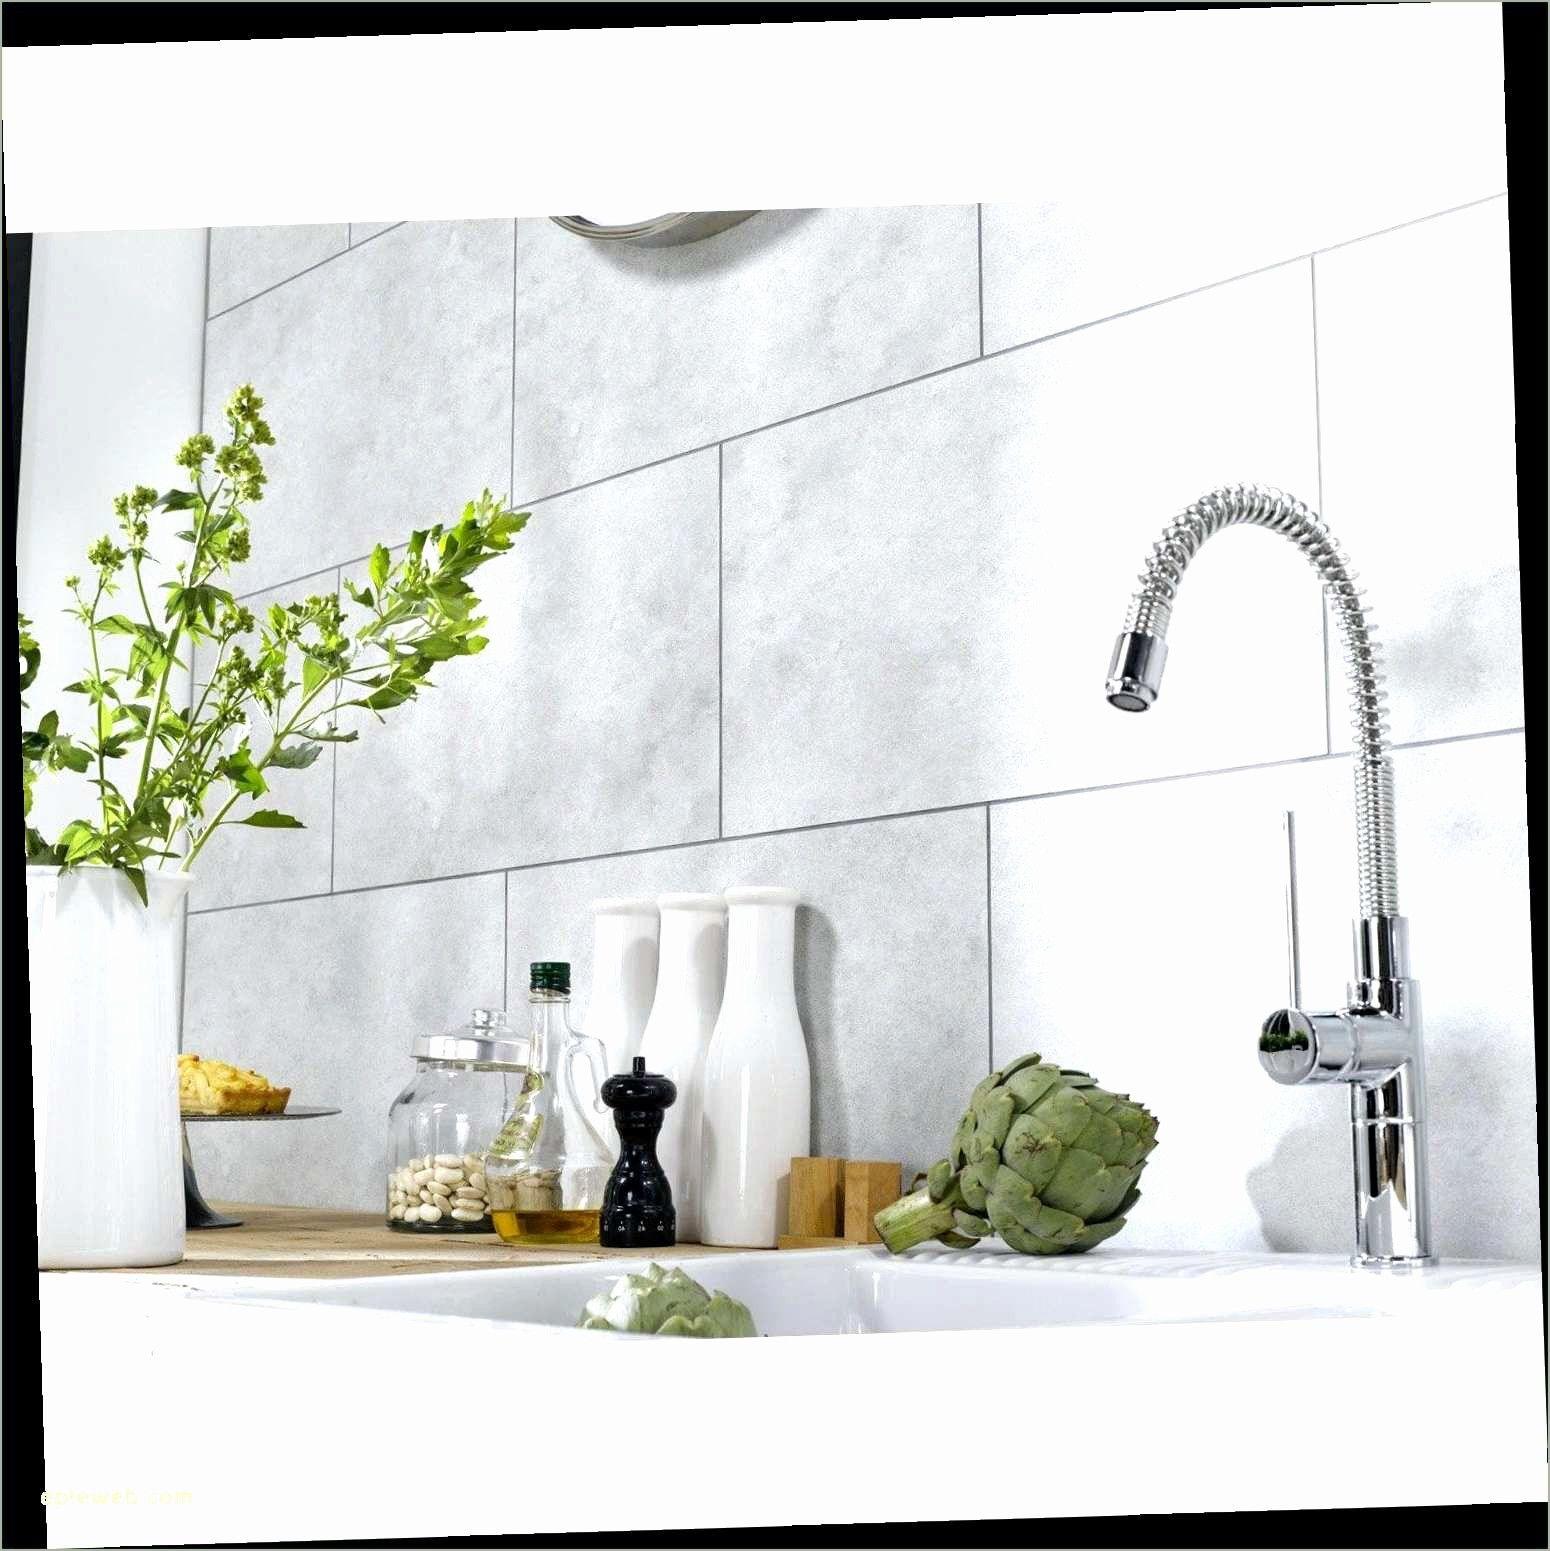 Best Of Revetement Mural Cuisine Pvc Trendy Bathroom Modern Steam Showers Bathroom